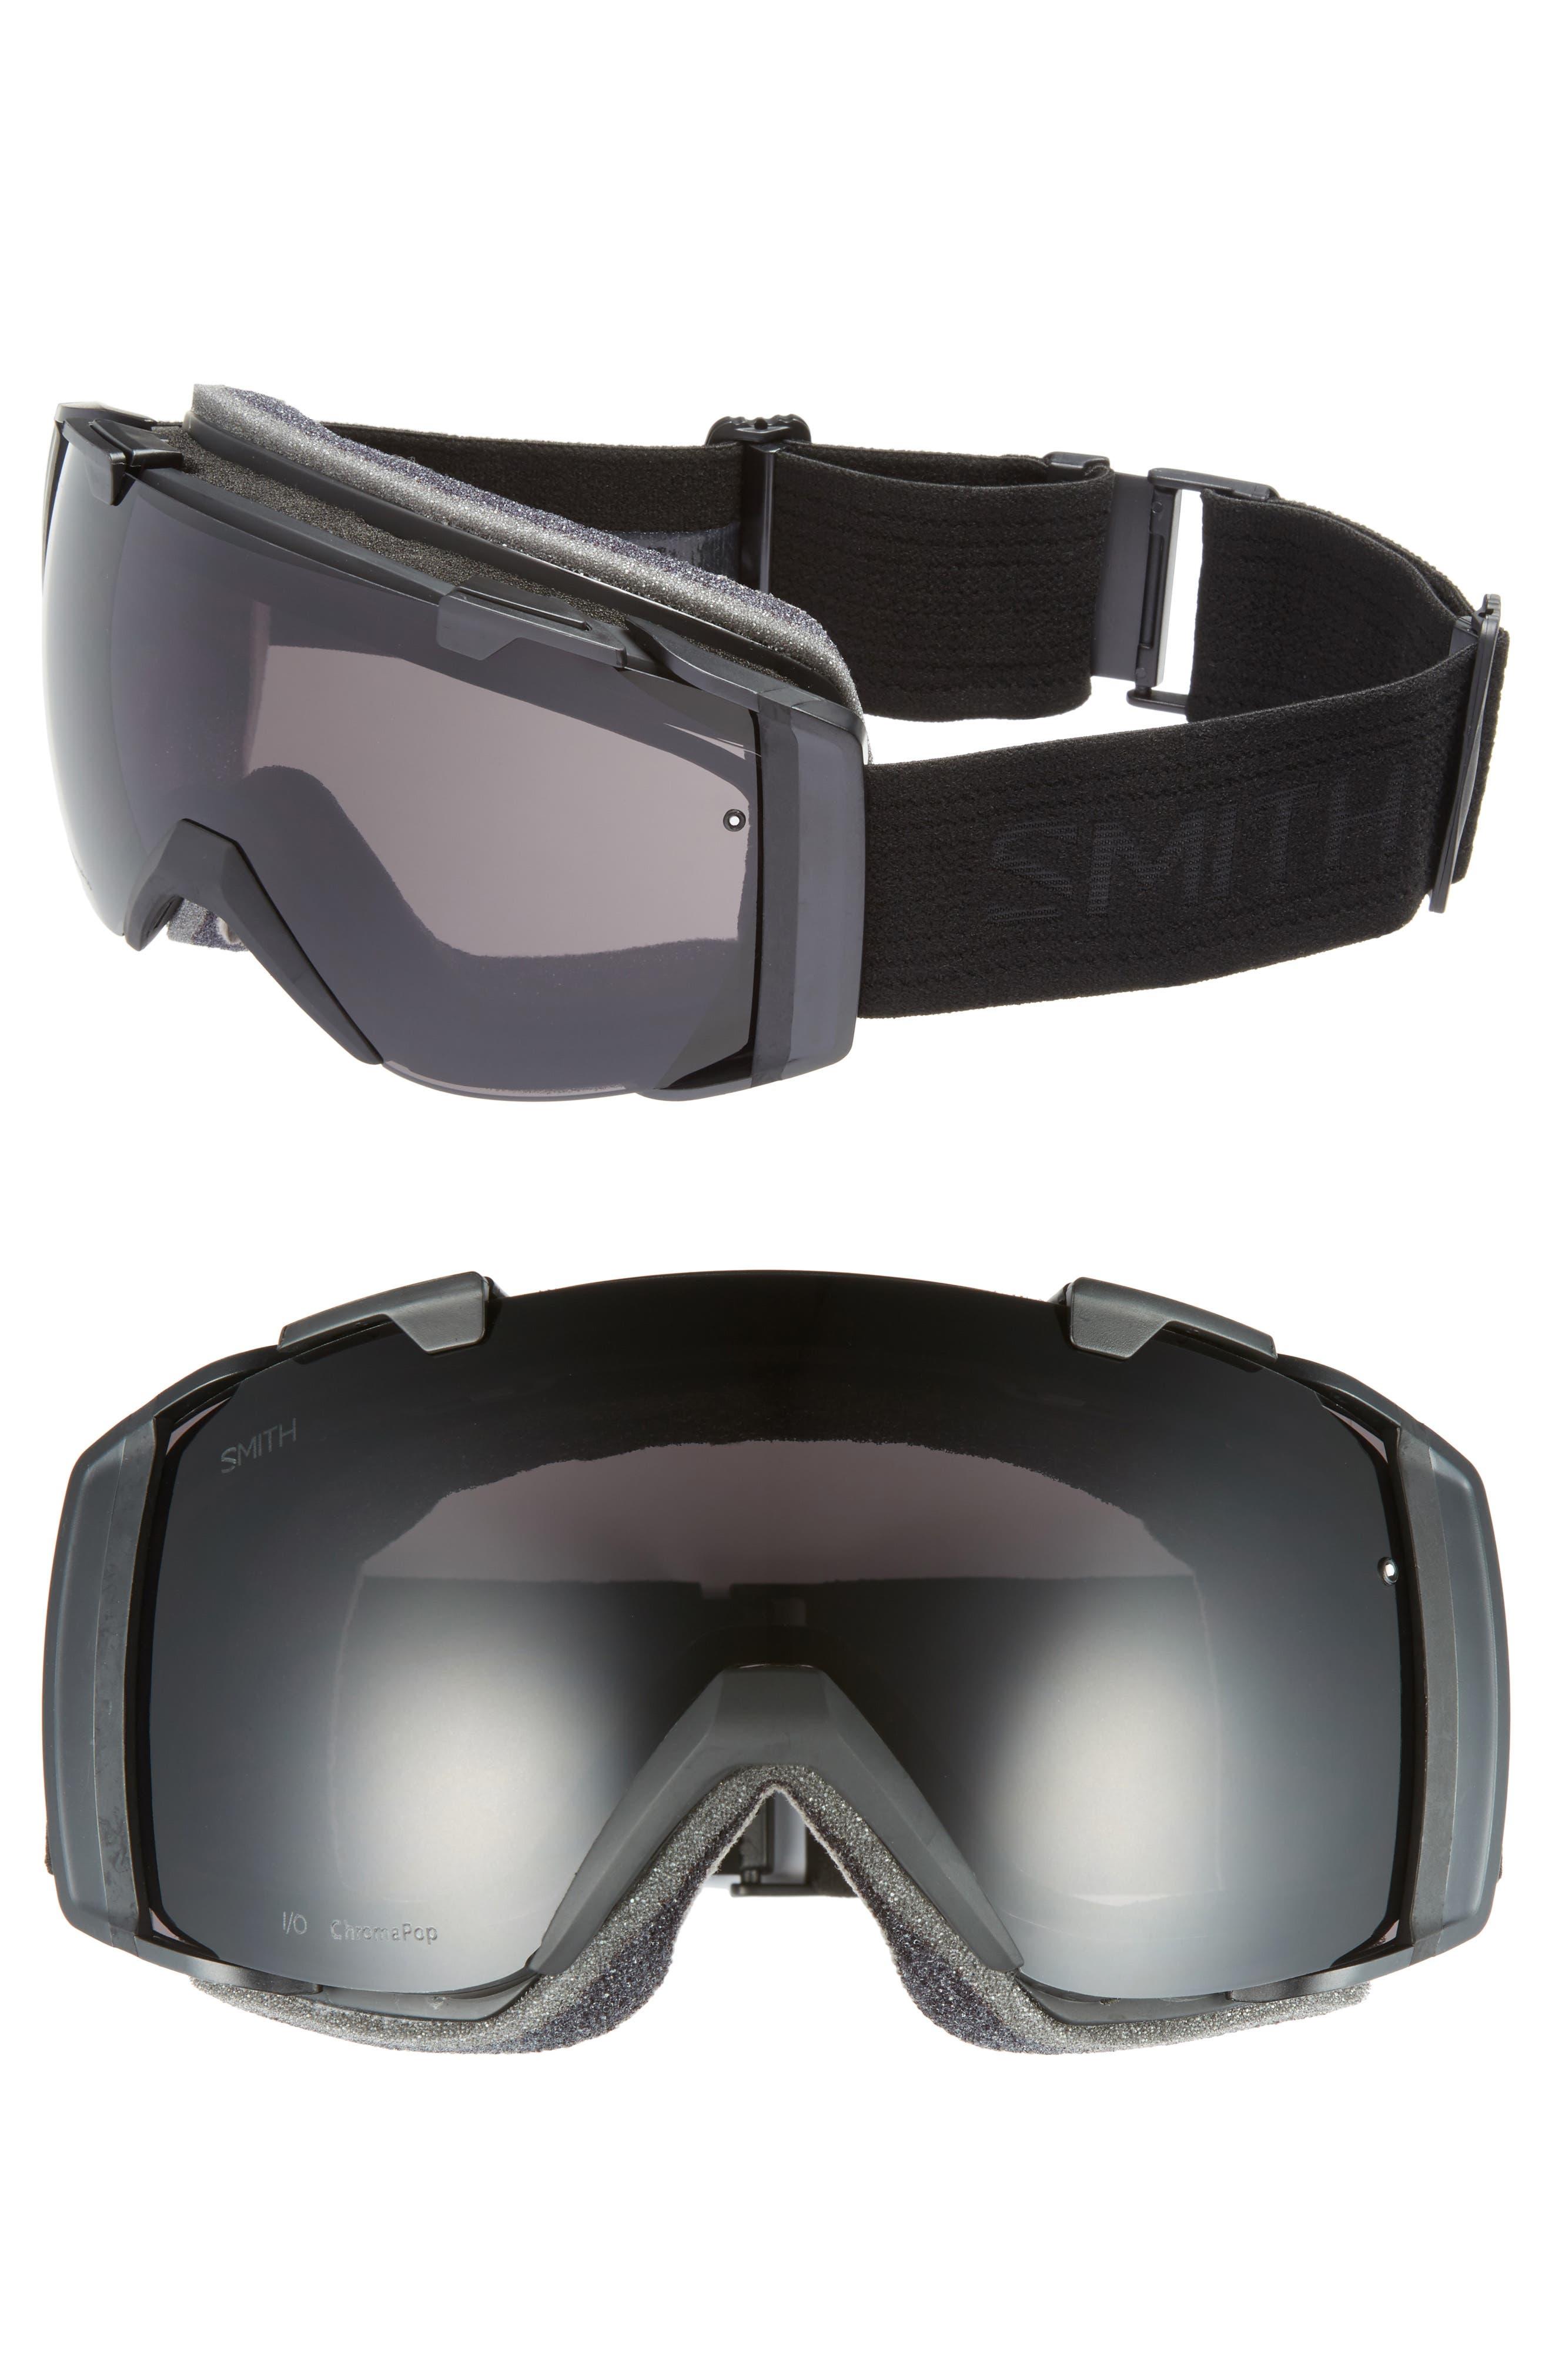 I/O 185mm Snow/Ski Goggles,                             Main thumbnail 1, color,                             BLACKOUT/ MIRROR